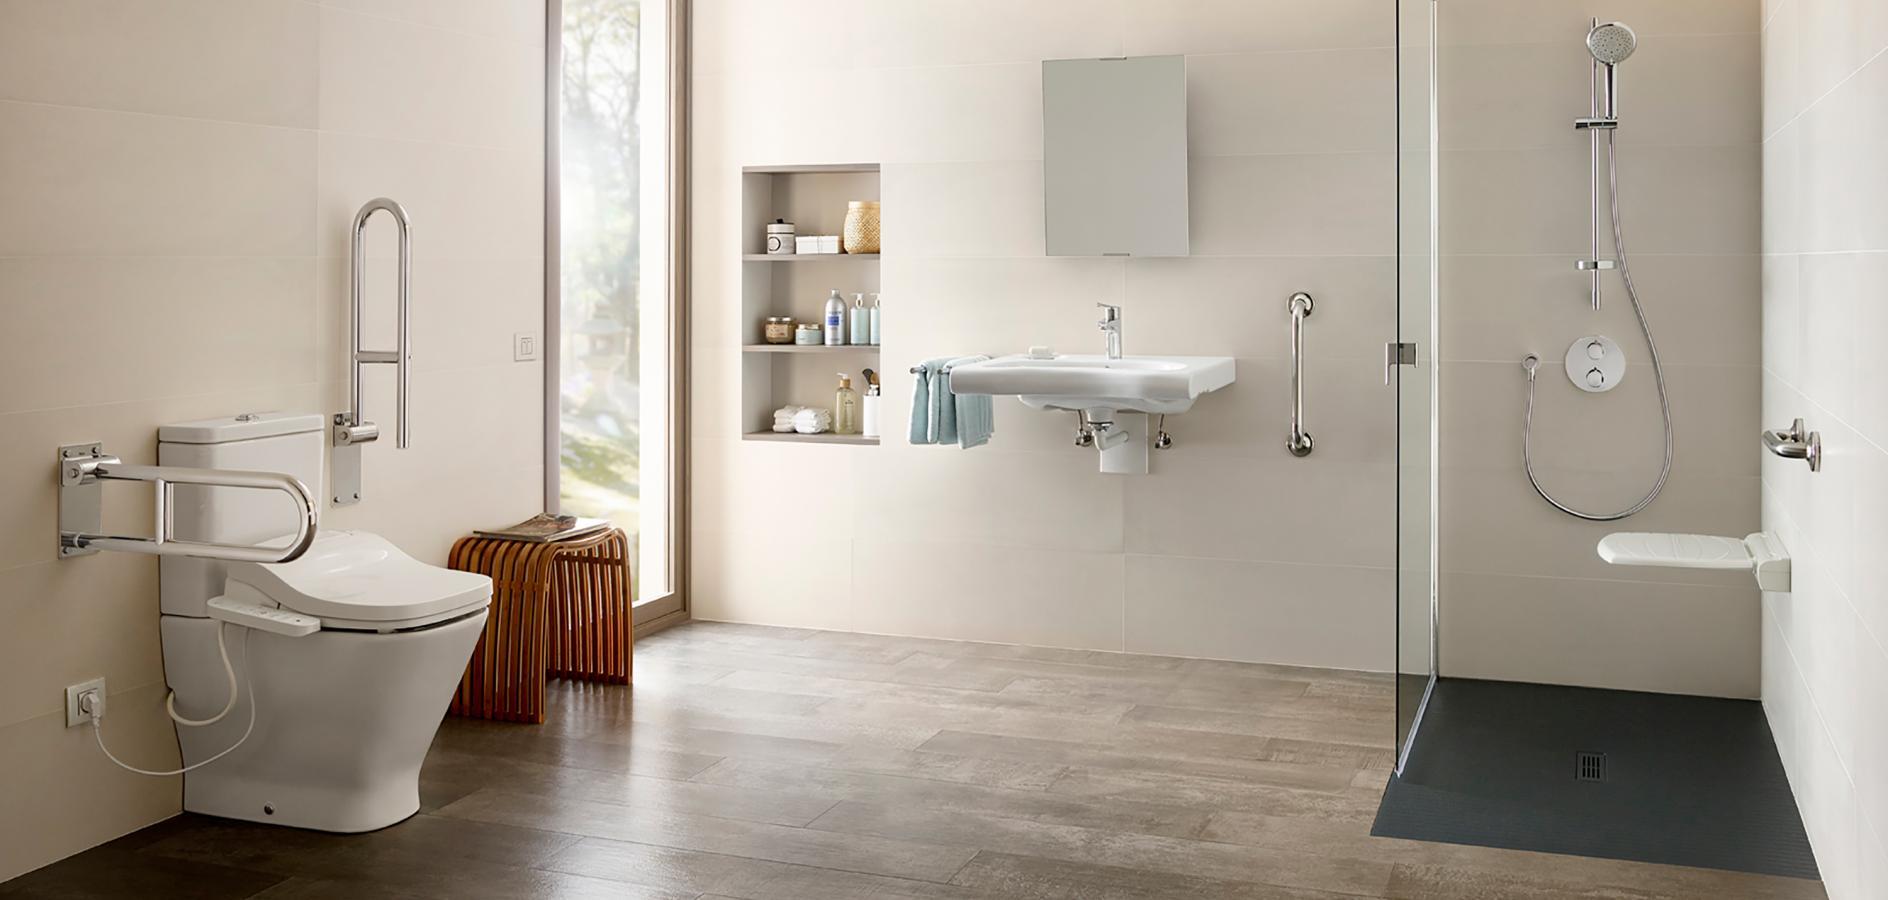 Designing Bathrooms For The Elderly, Bathroom Designs For Seniors